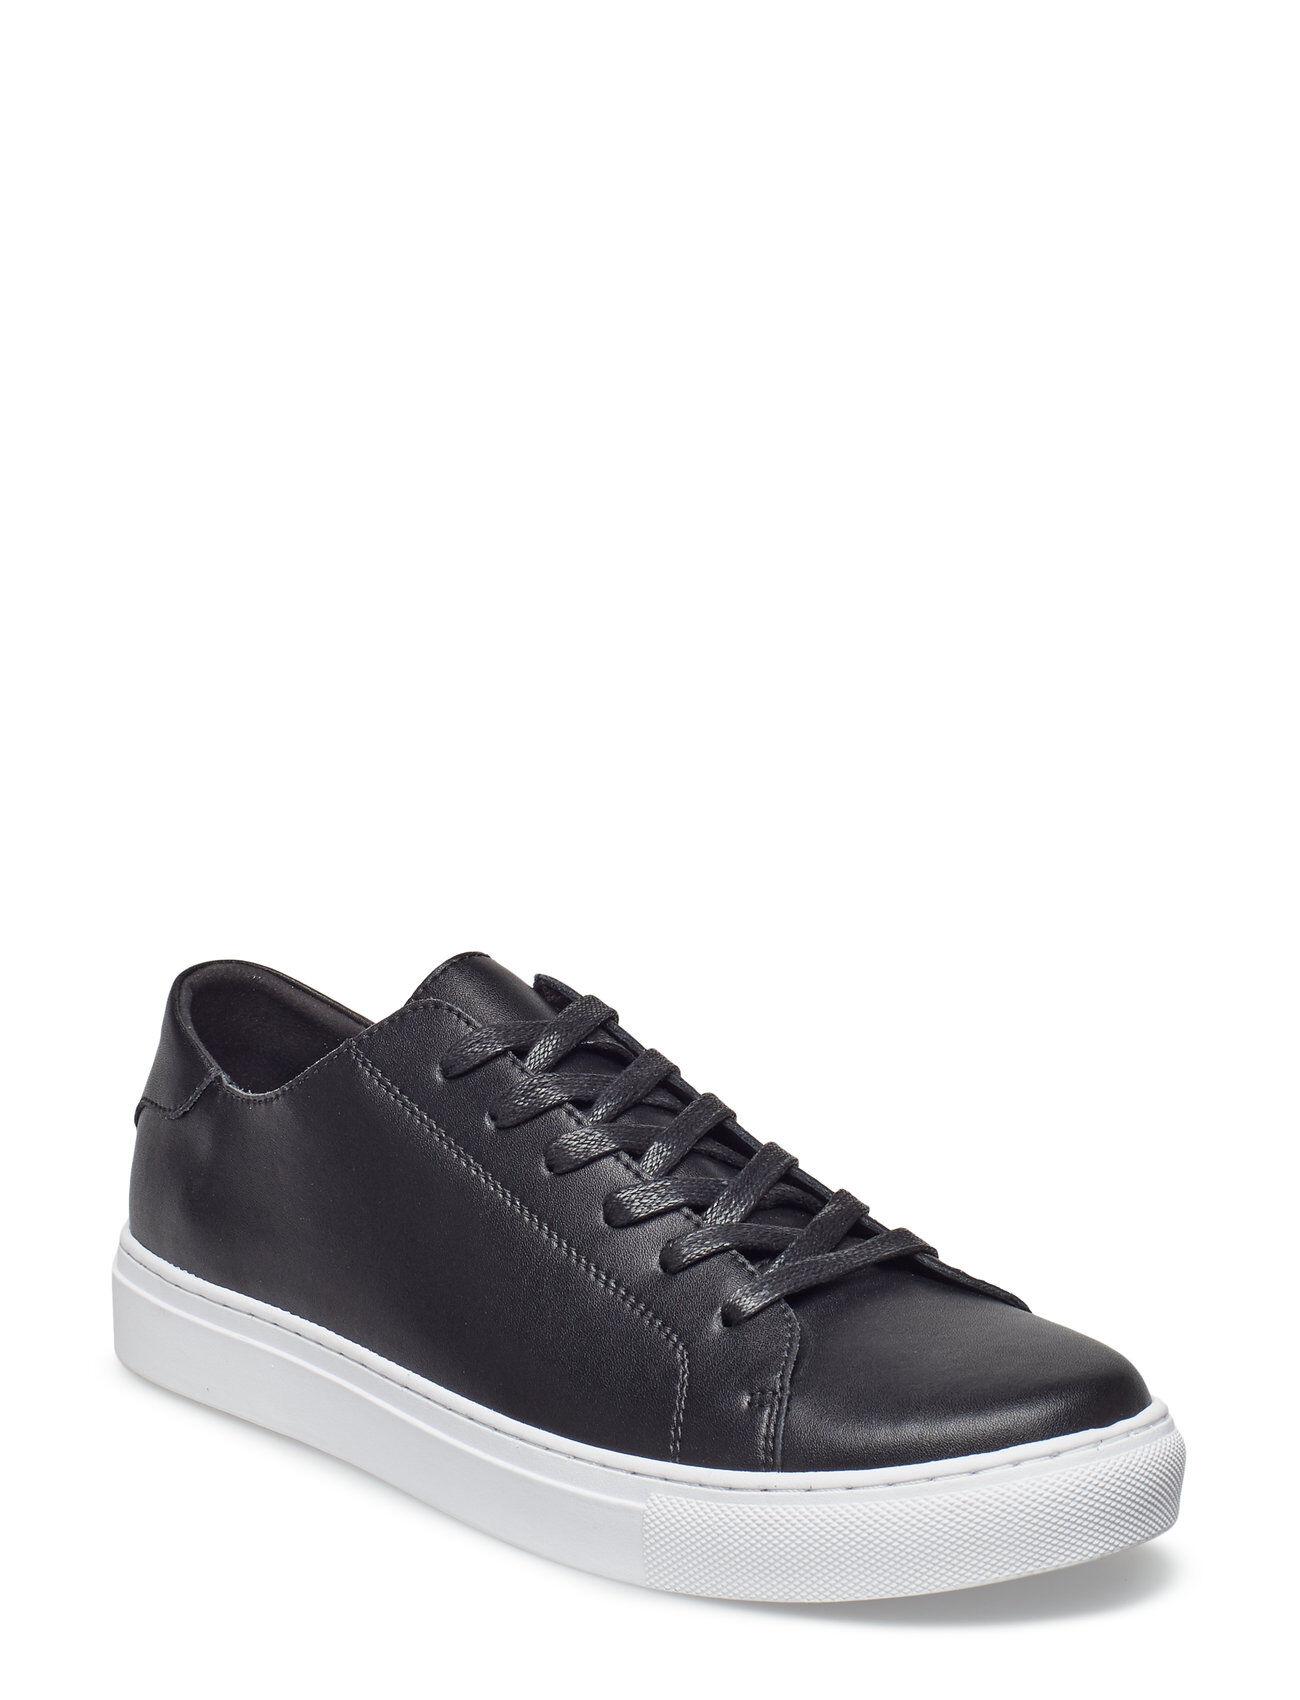 Lindbergh Leather Sneaker